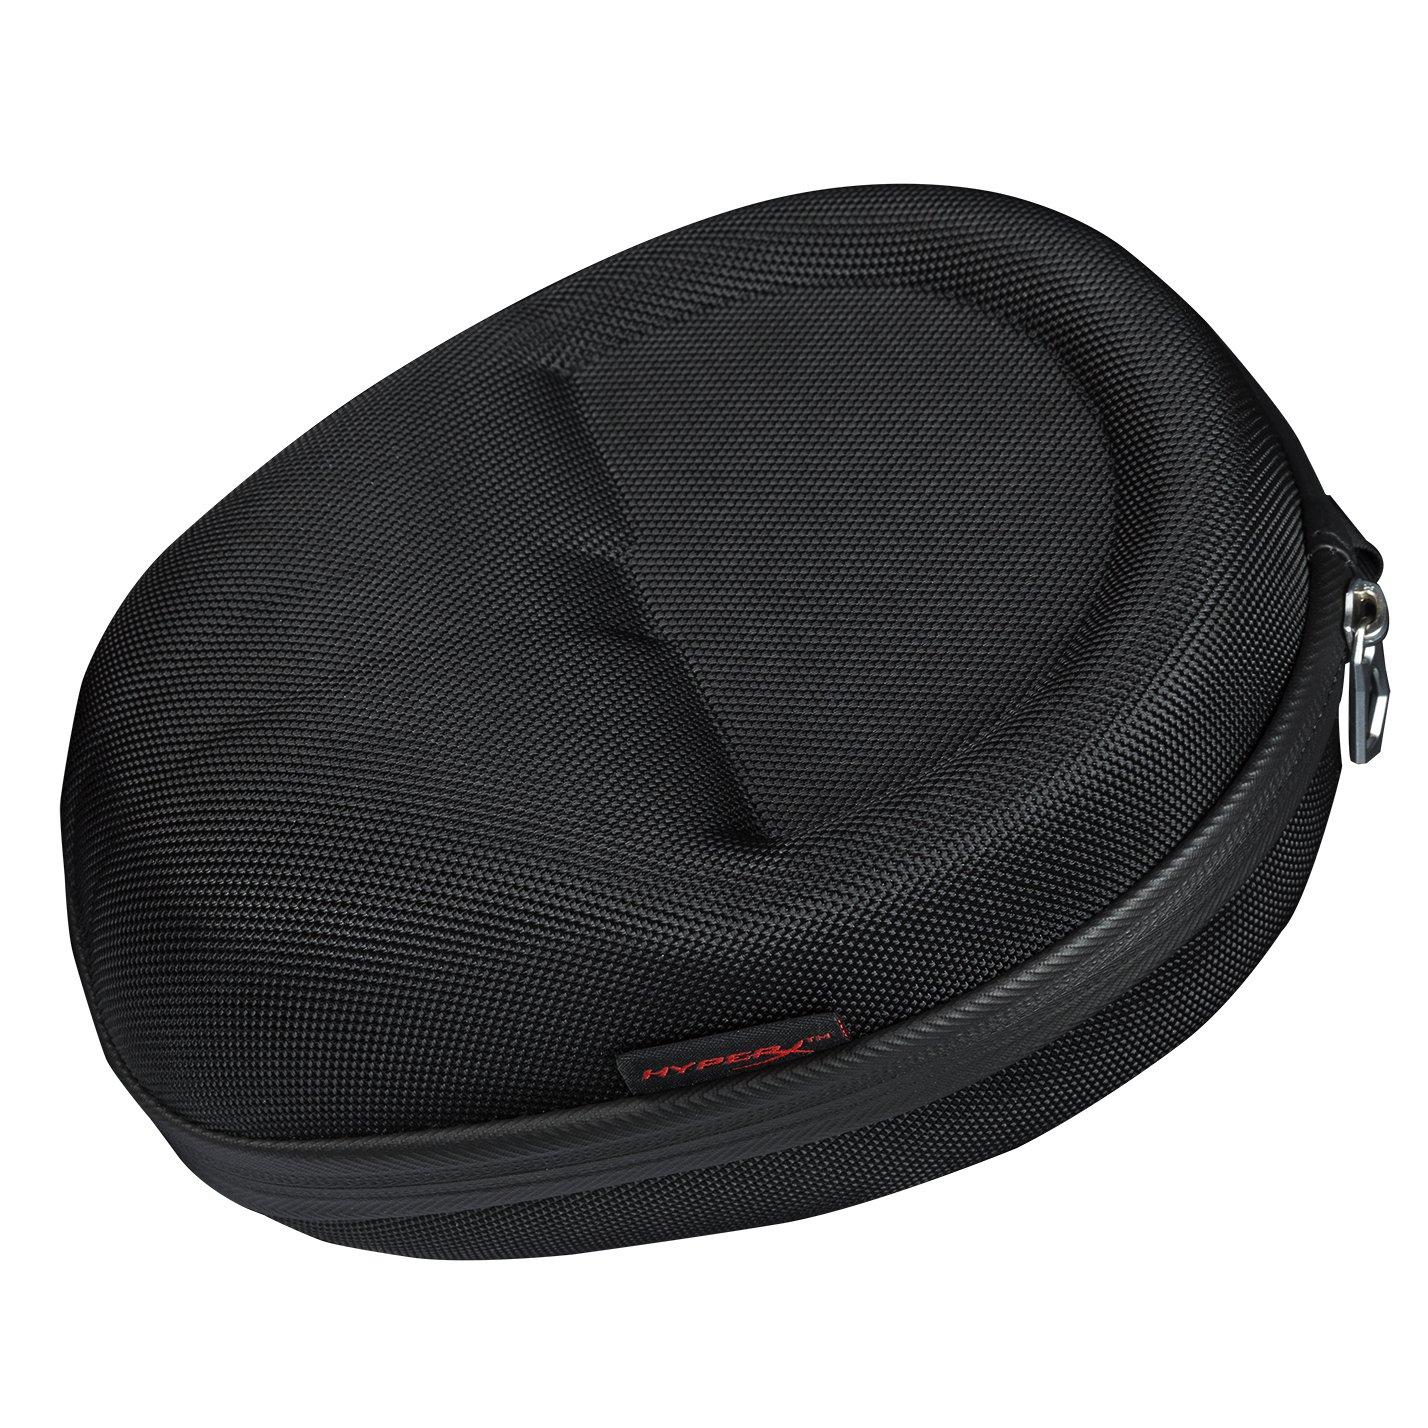 add on item kingston technology hyperx cloud headset carrying case. Black Bedroom Furniture Sets. Home Design Ideas